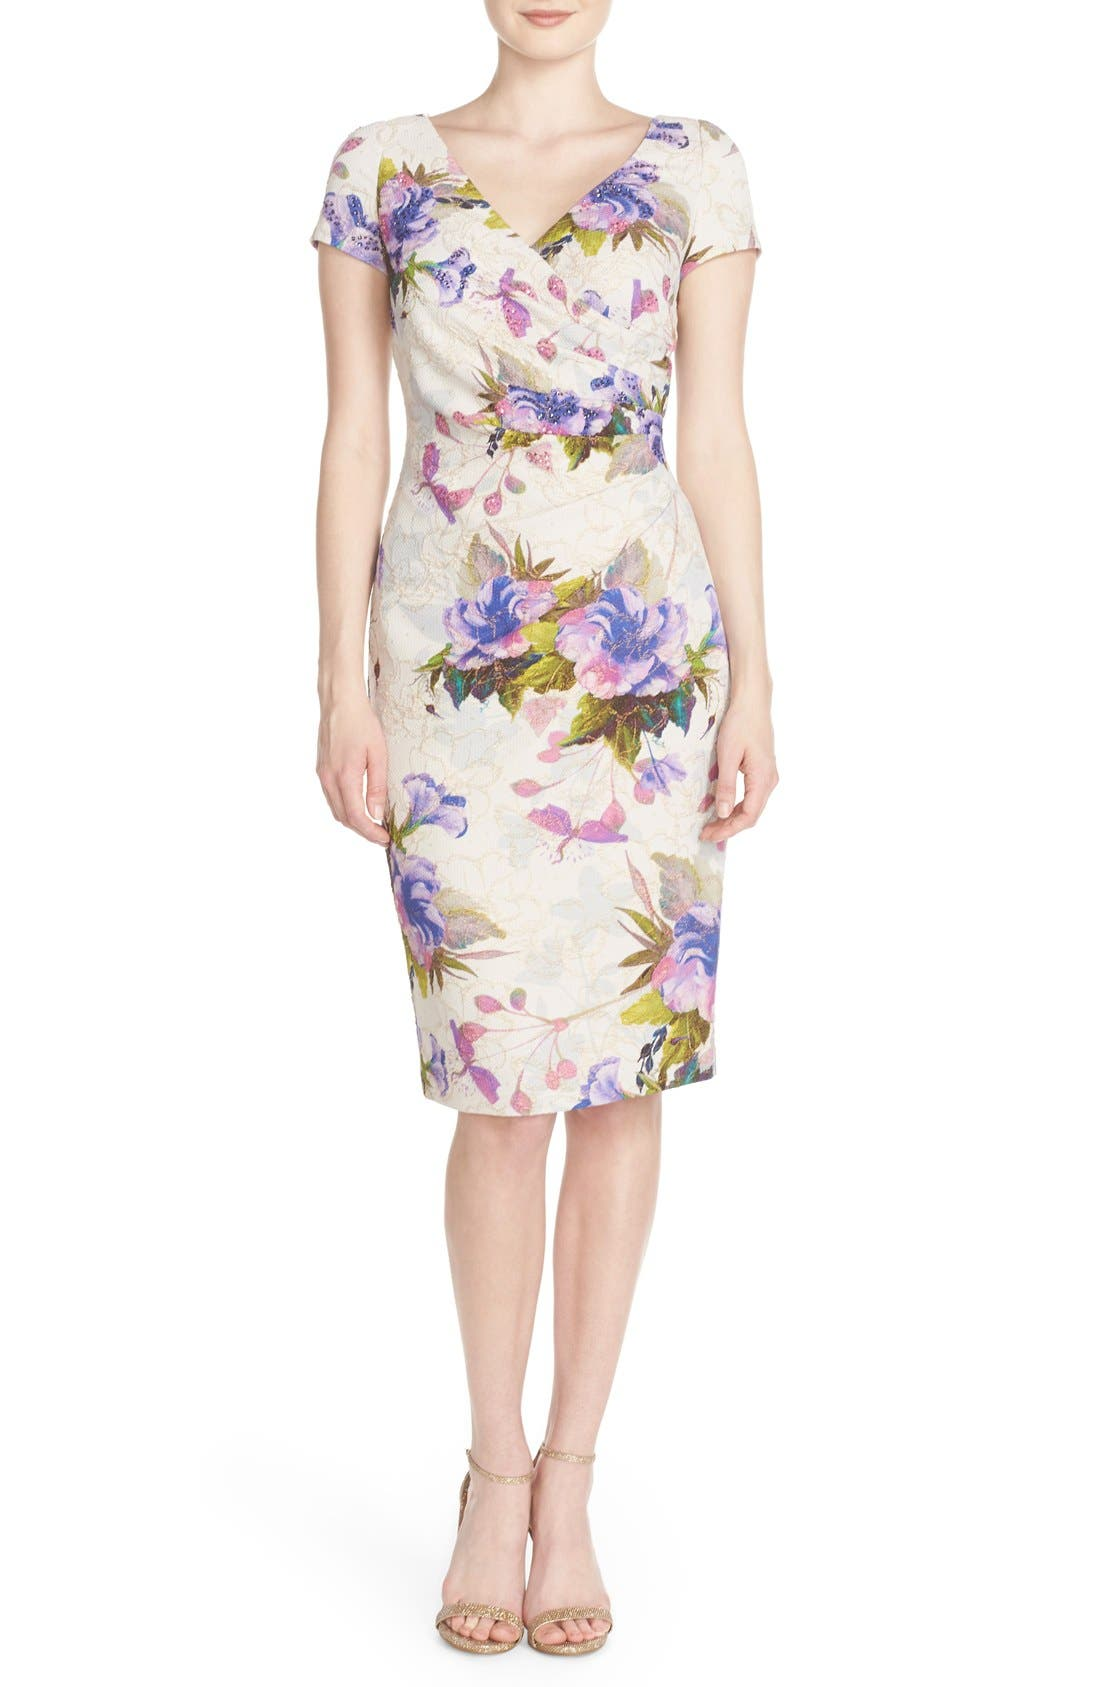 Alternate Image 1 Selected - Adrianna Papell 'Matlesse' Embellished Metallic Jacquard Sheath Dress